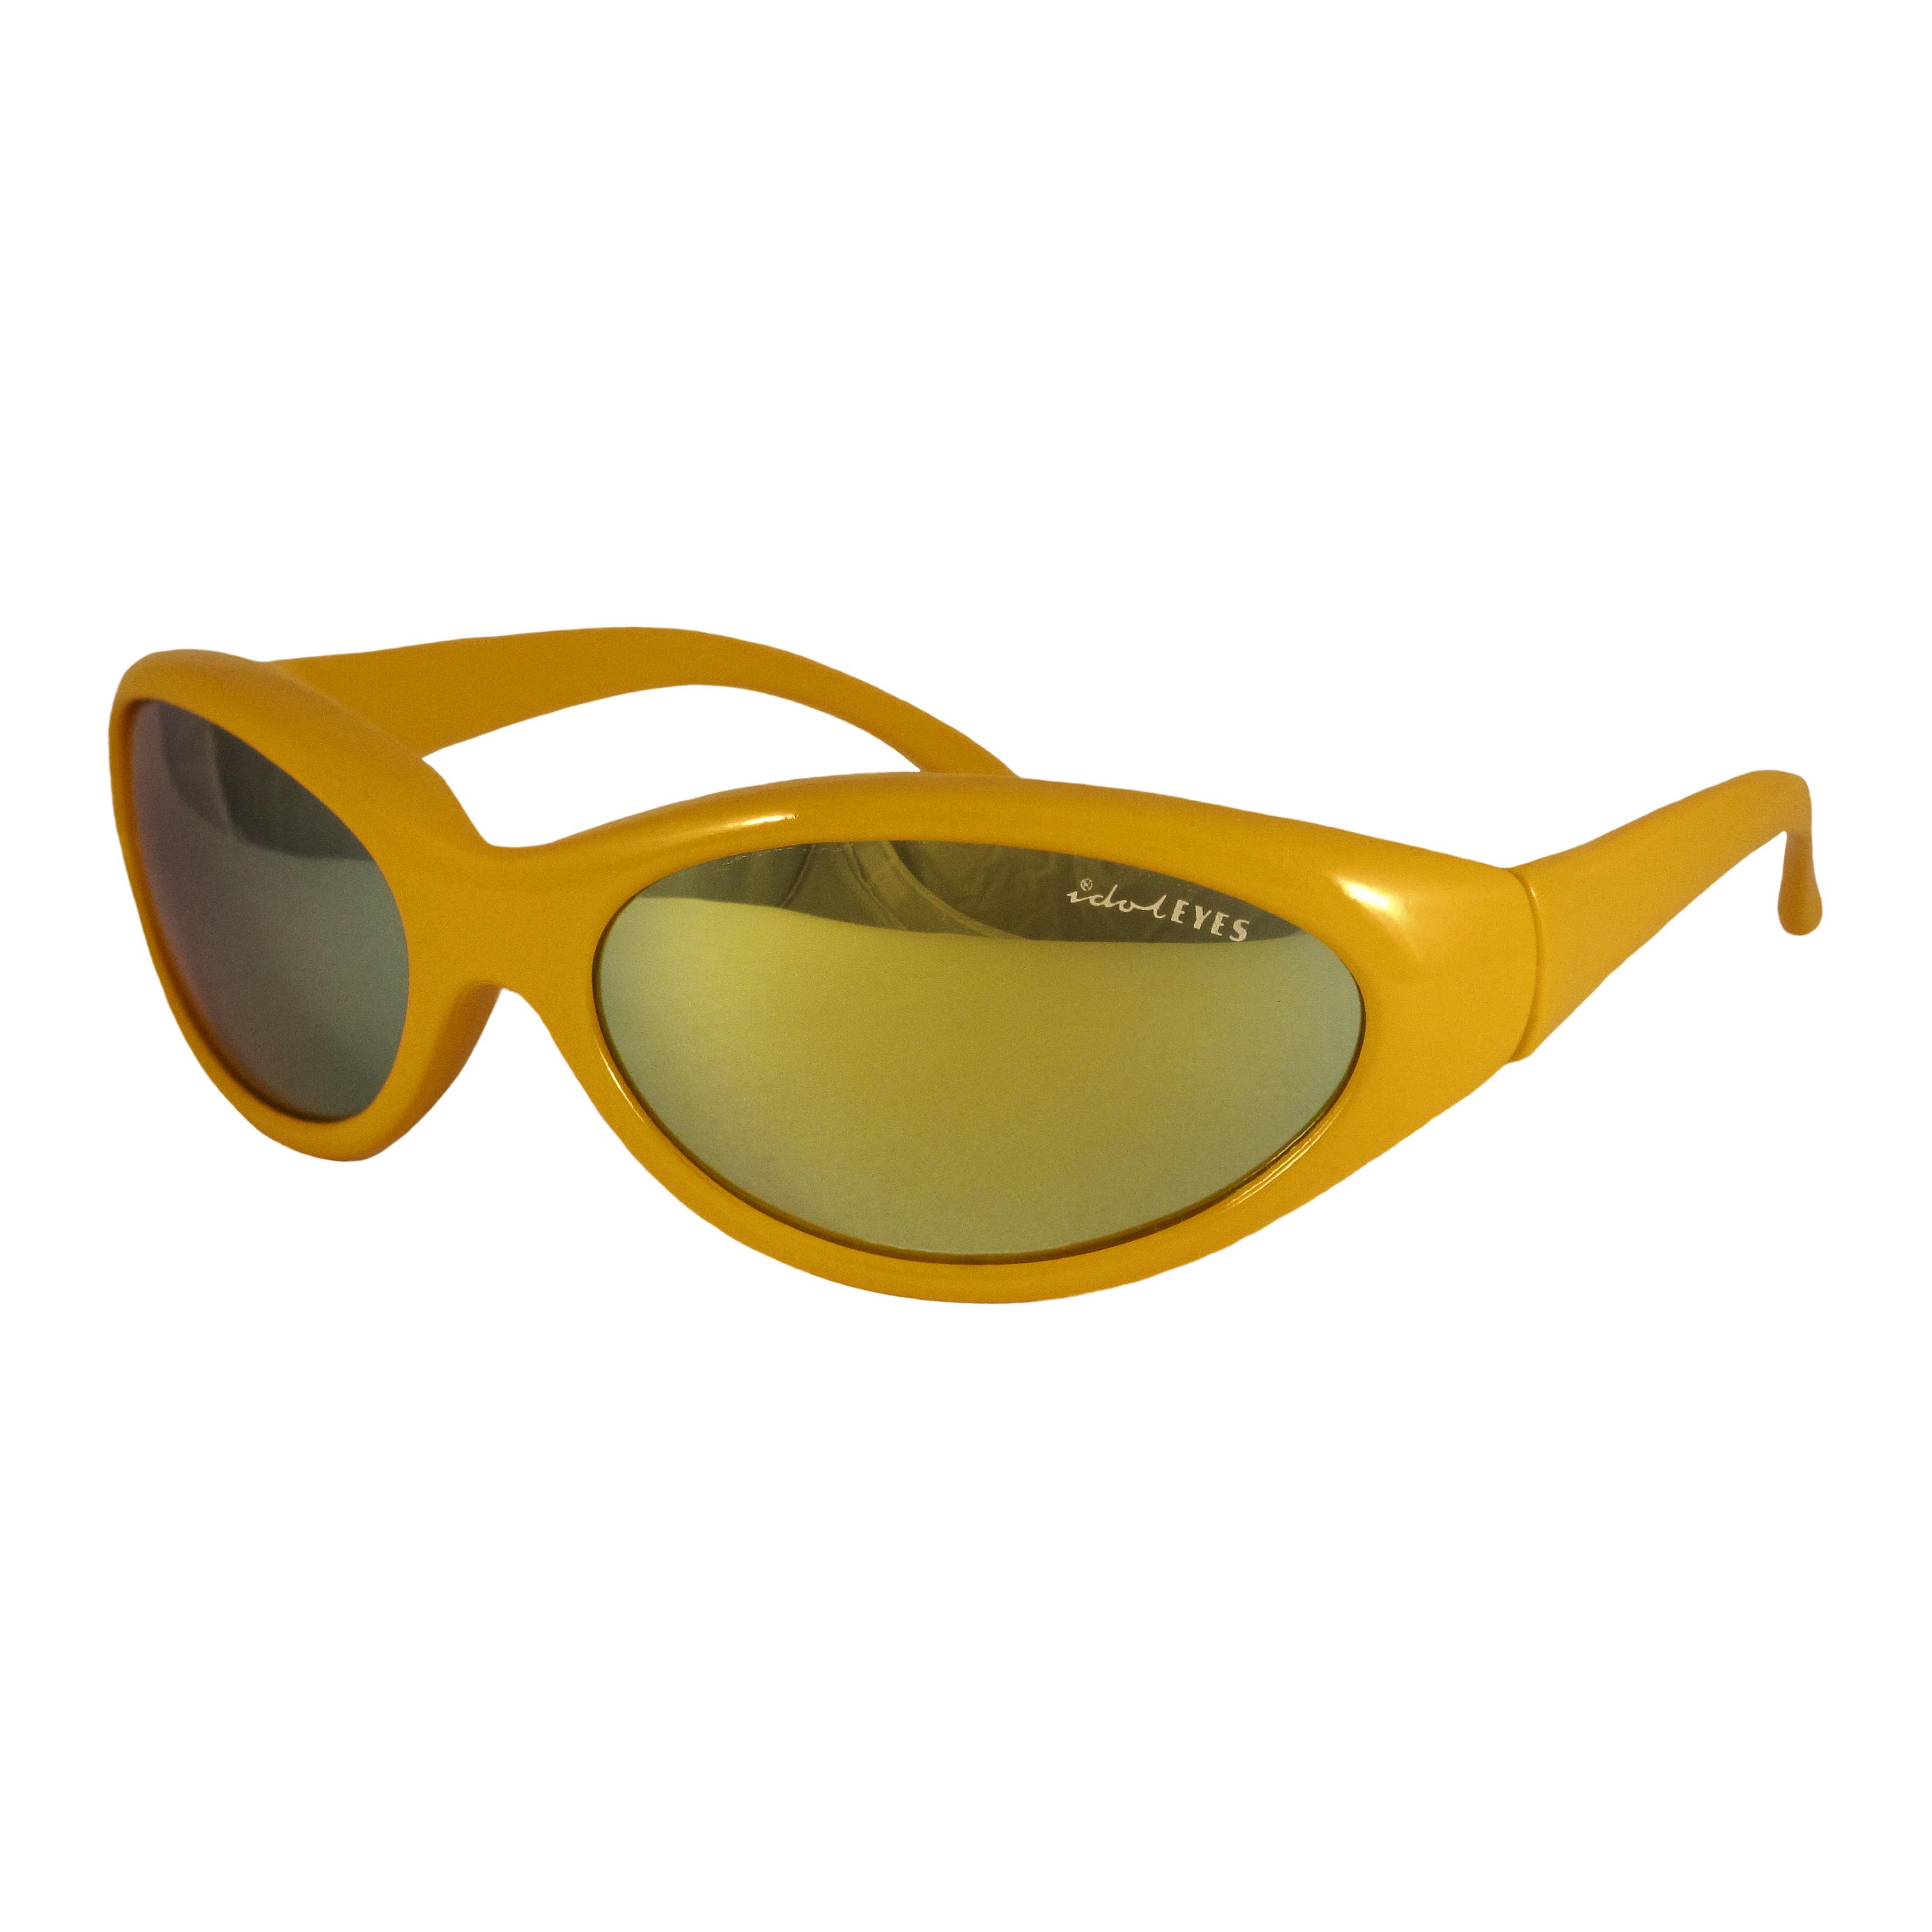 Tiny Tots II - IE687, Shiny Yellow frame